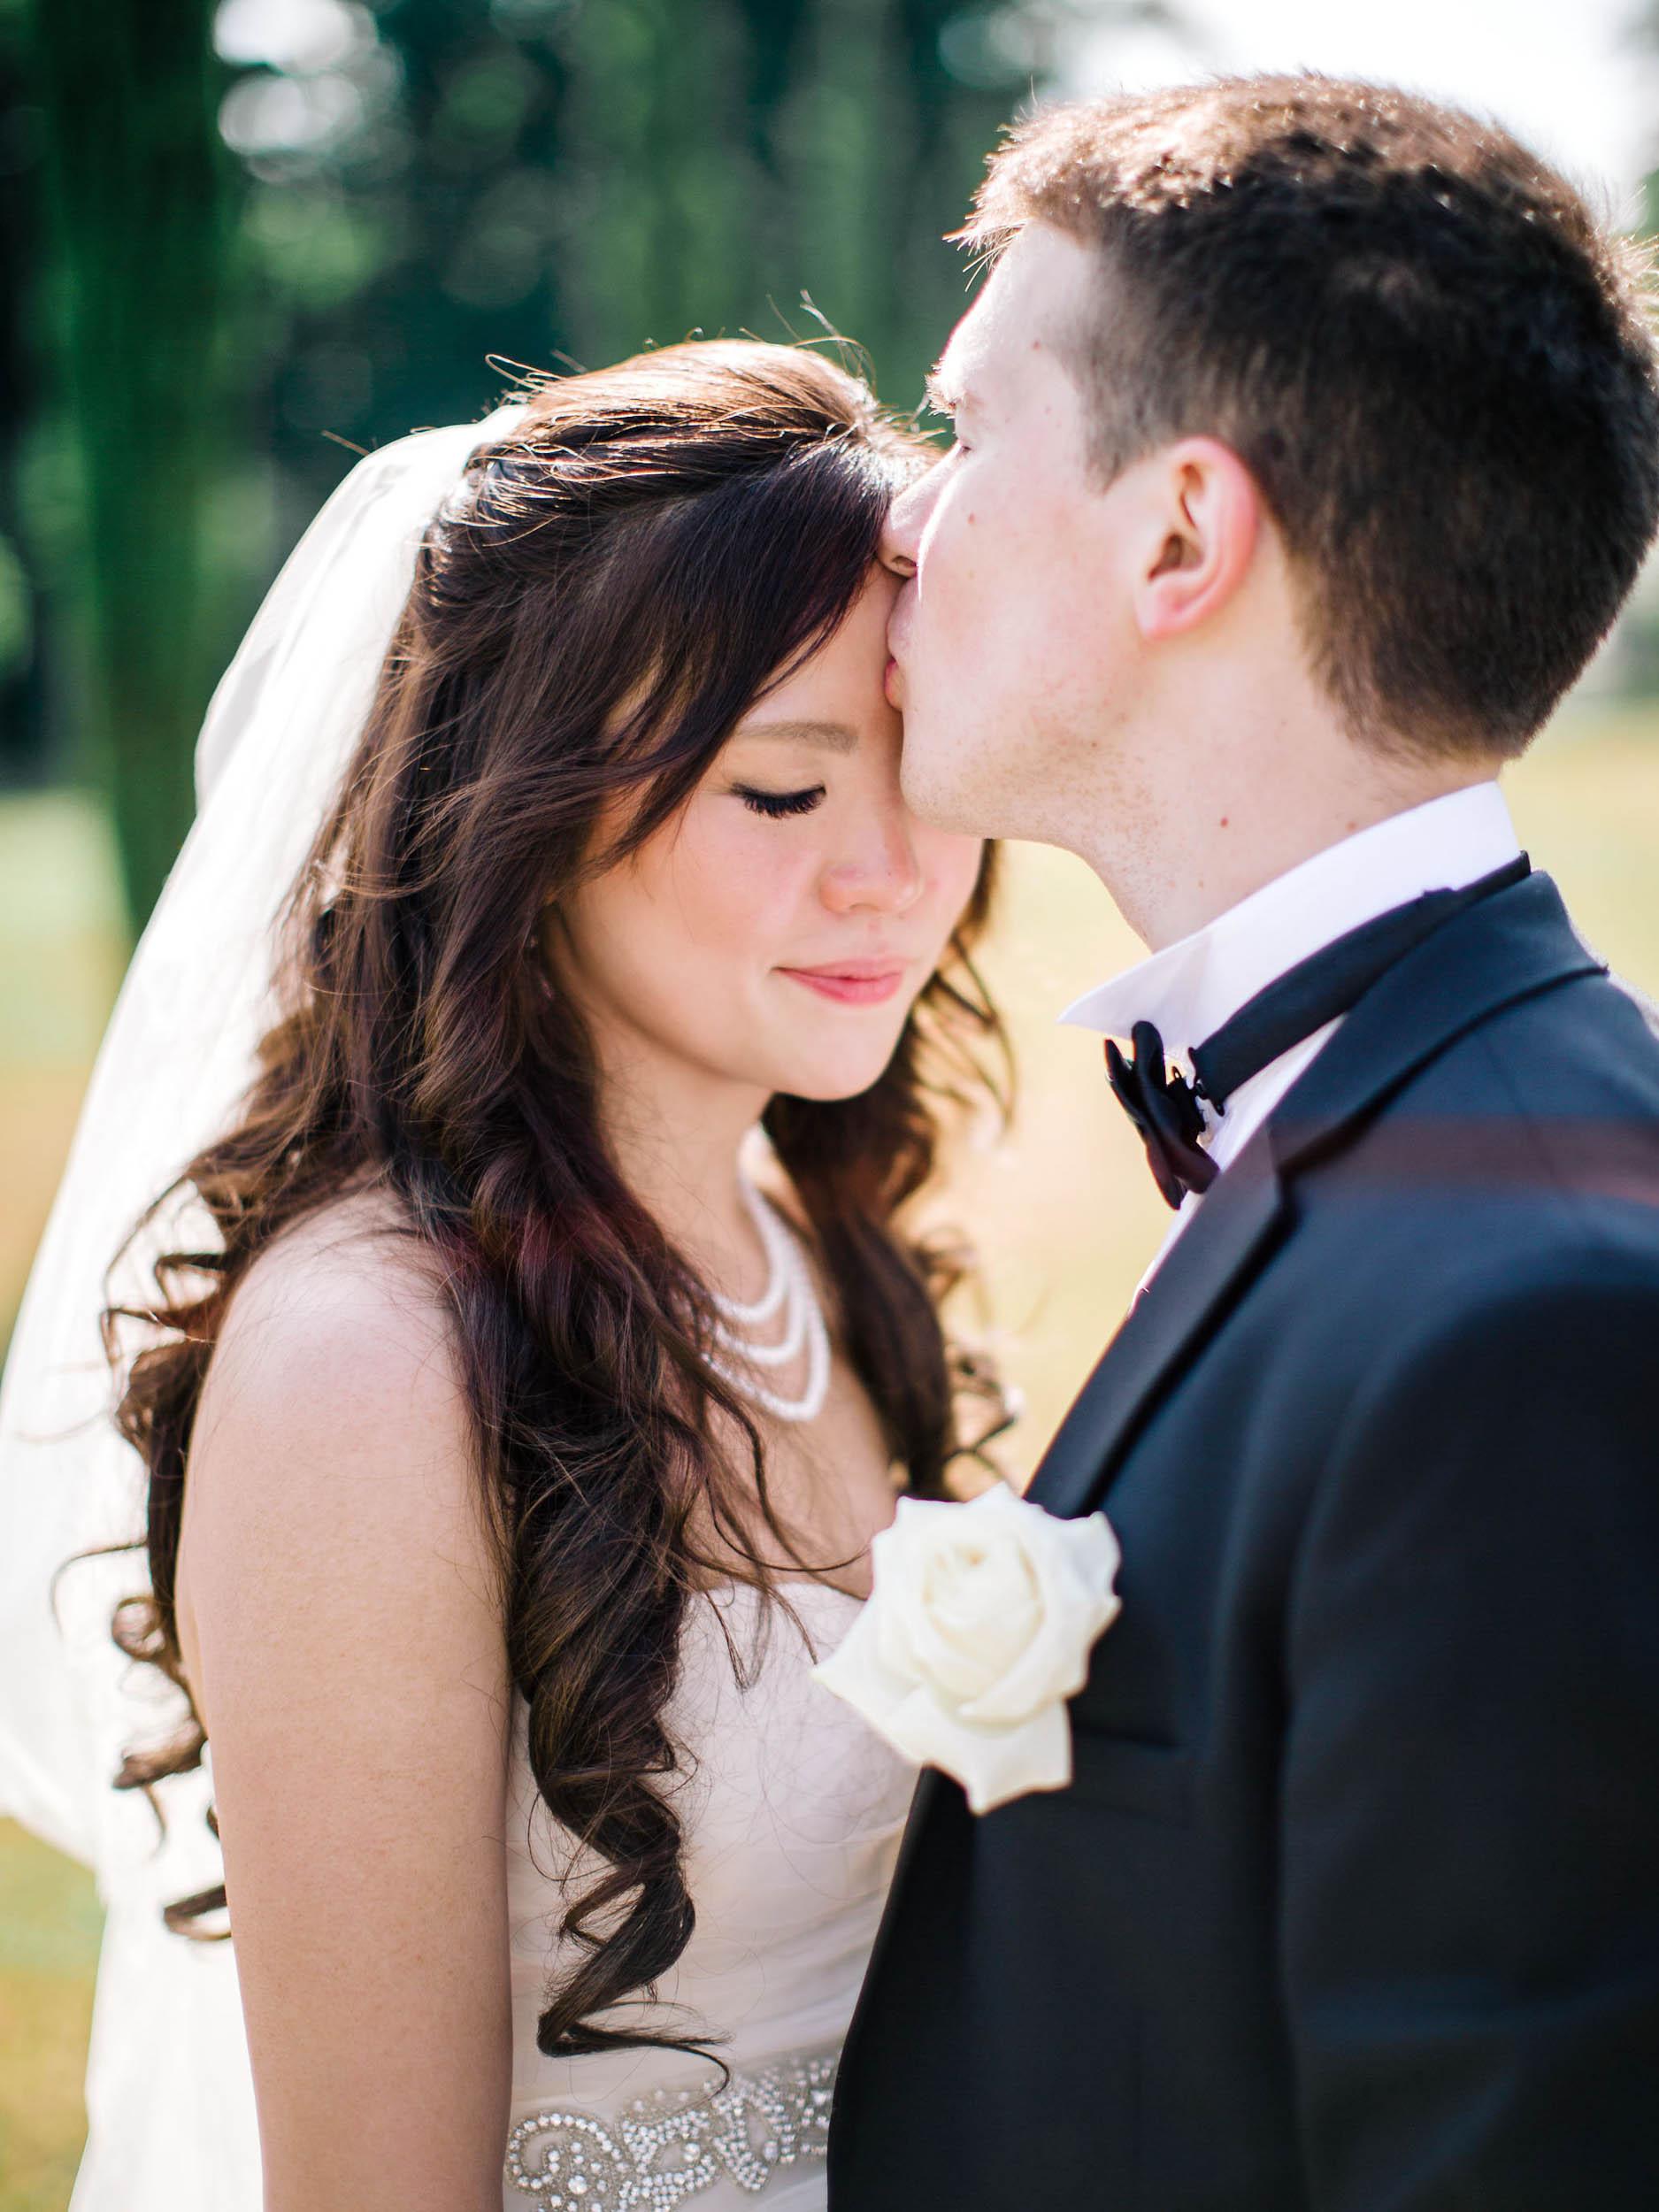 Amy O'Boyle Photography- Destination & UK Fine Art Film Wedding Photographer- Chateau La Durantie Wedding-45.jpg